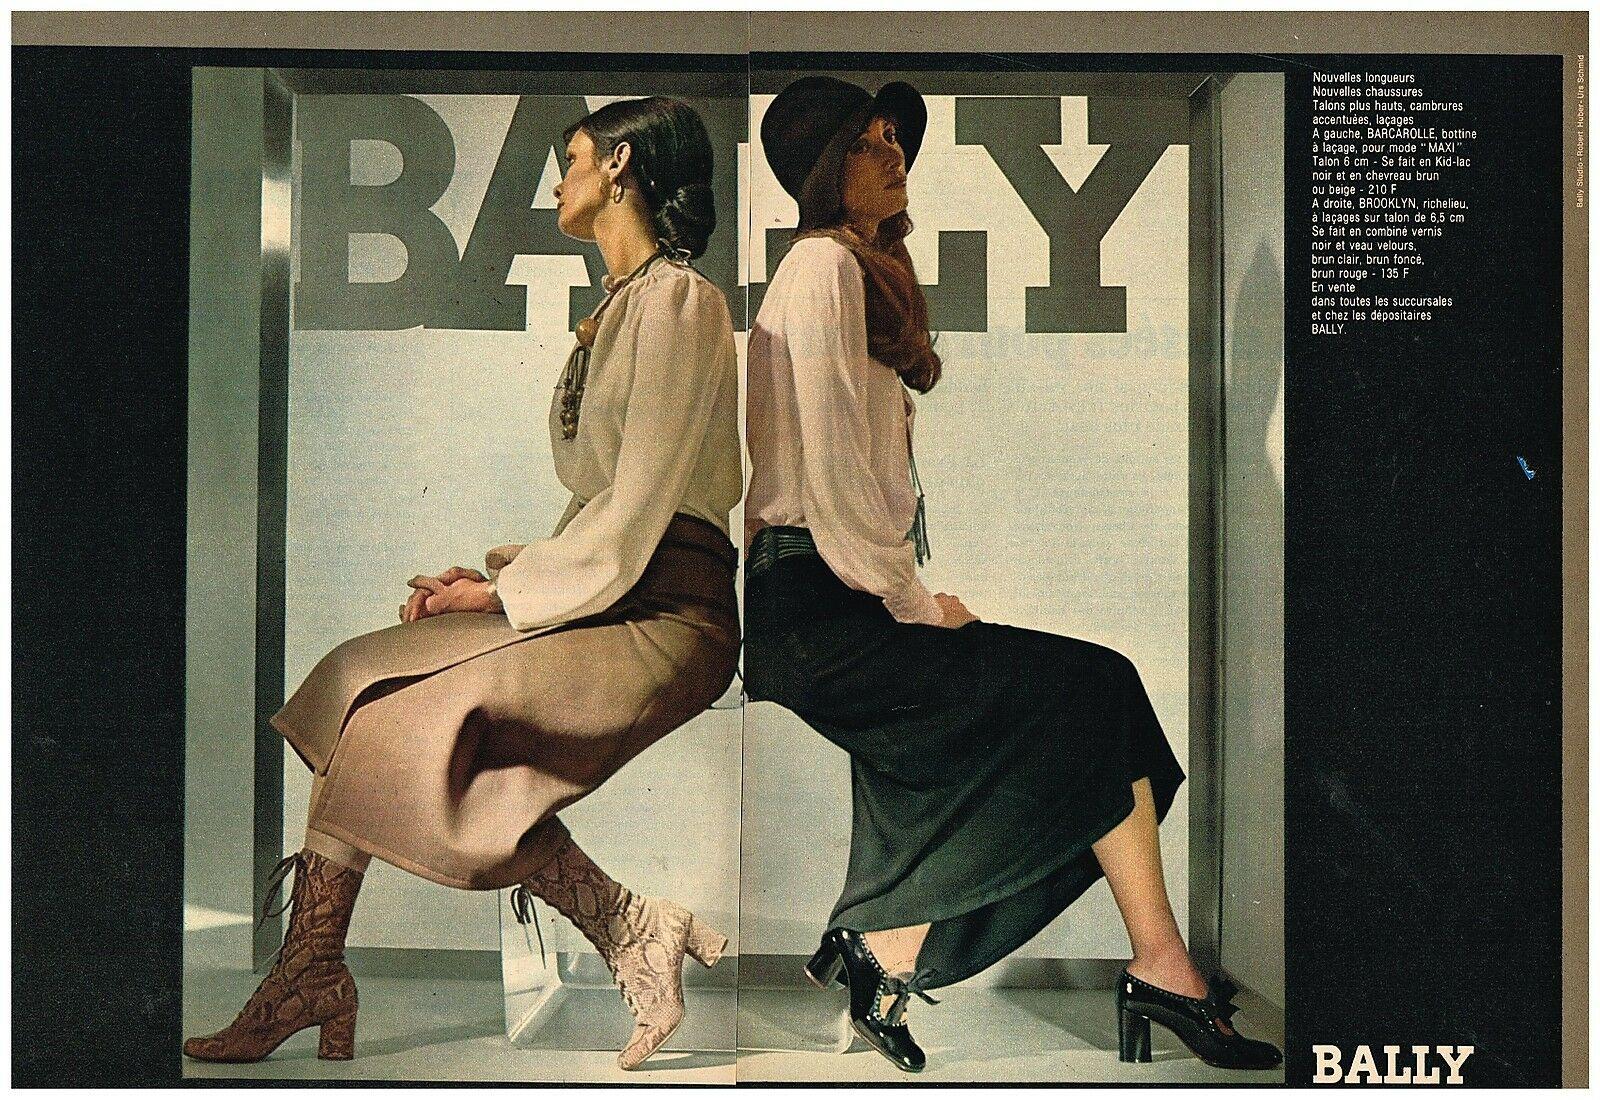 Bally par Huber 1970